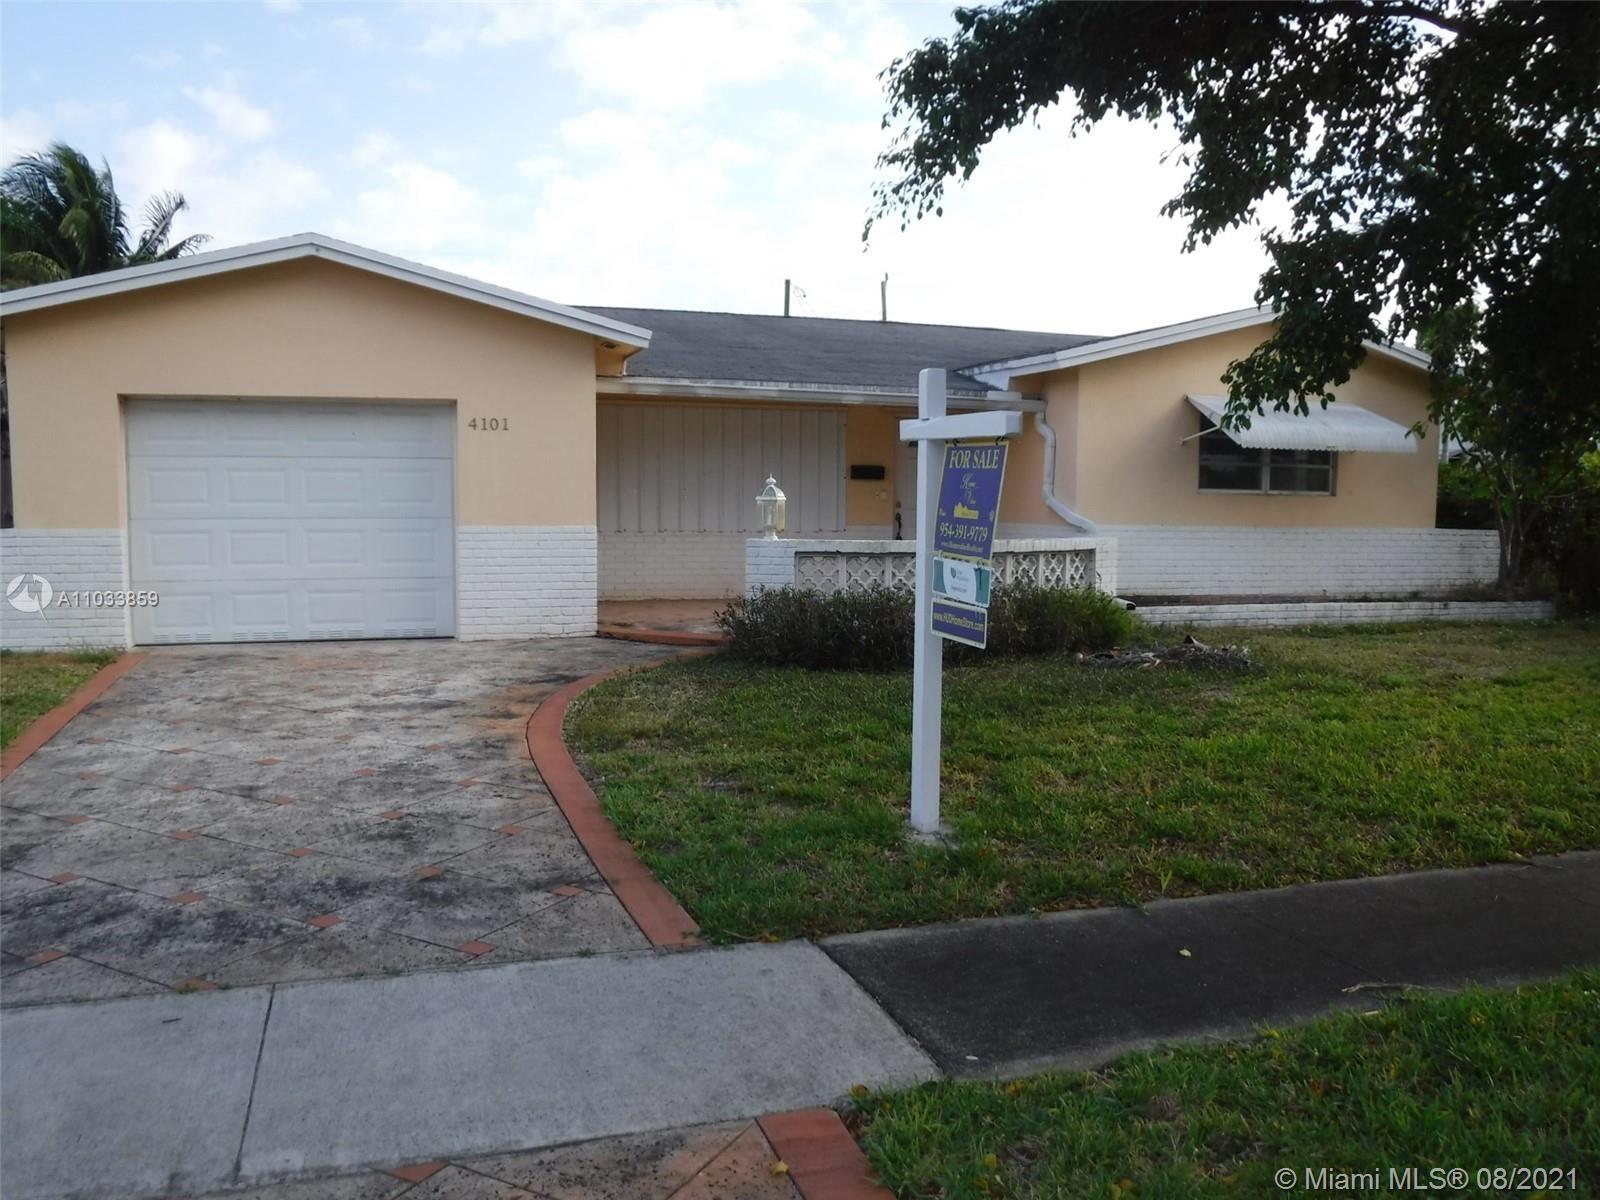 4101 Monroe St, Hollywood, FL 33021 - #: A11033859